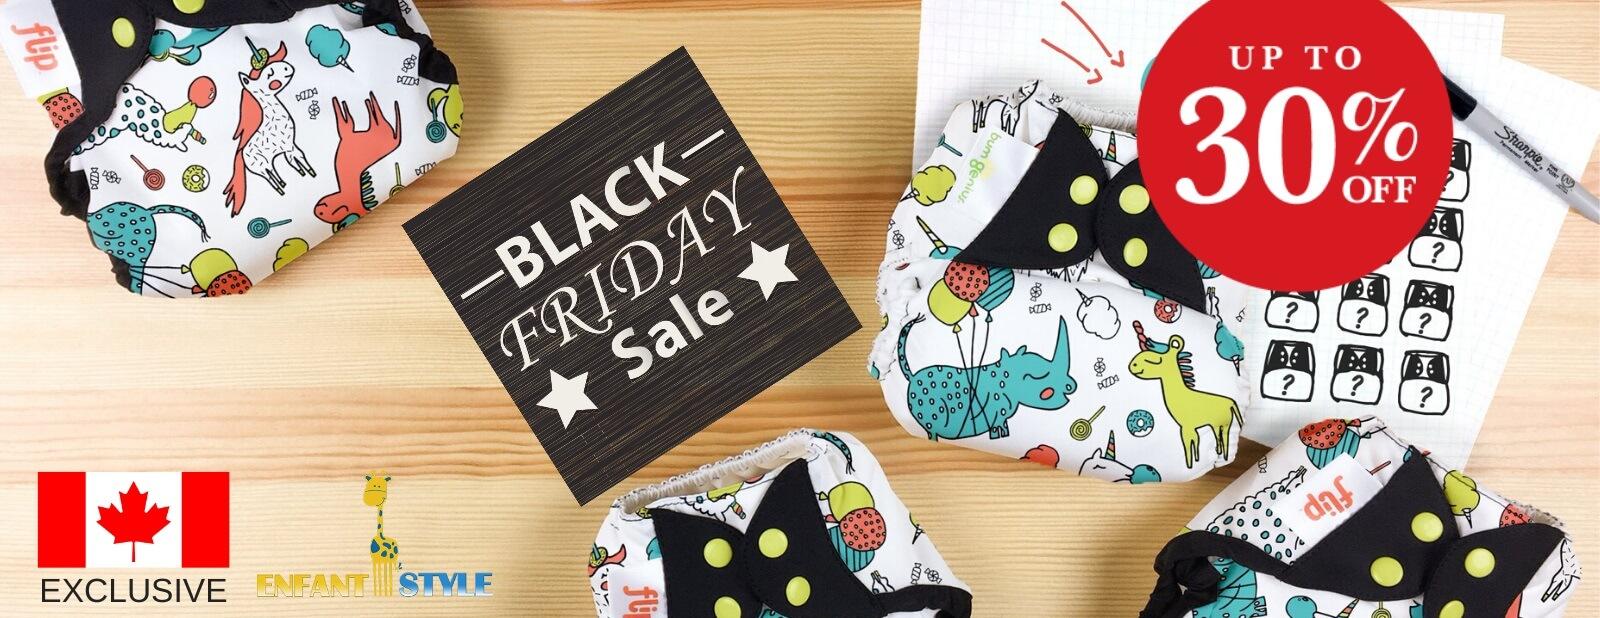 bumgenius doodles collection black friday sale